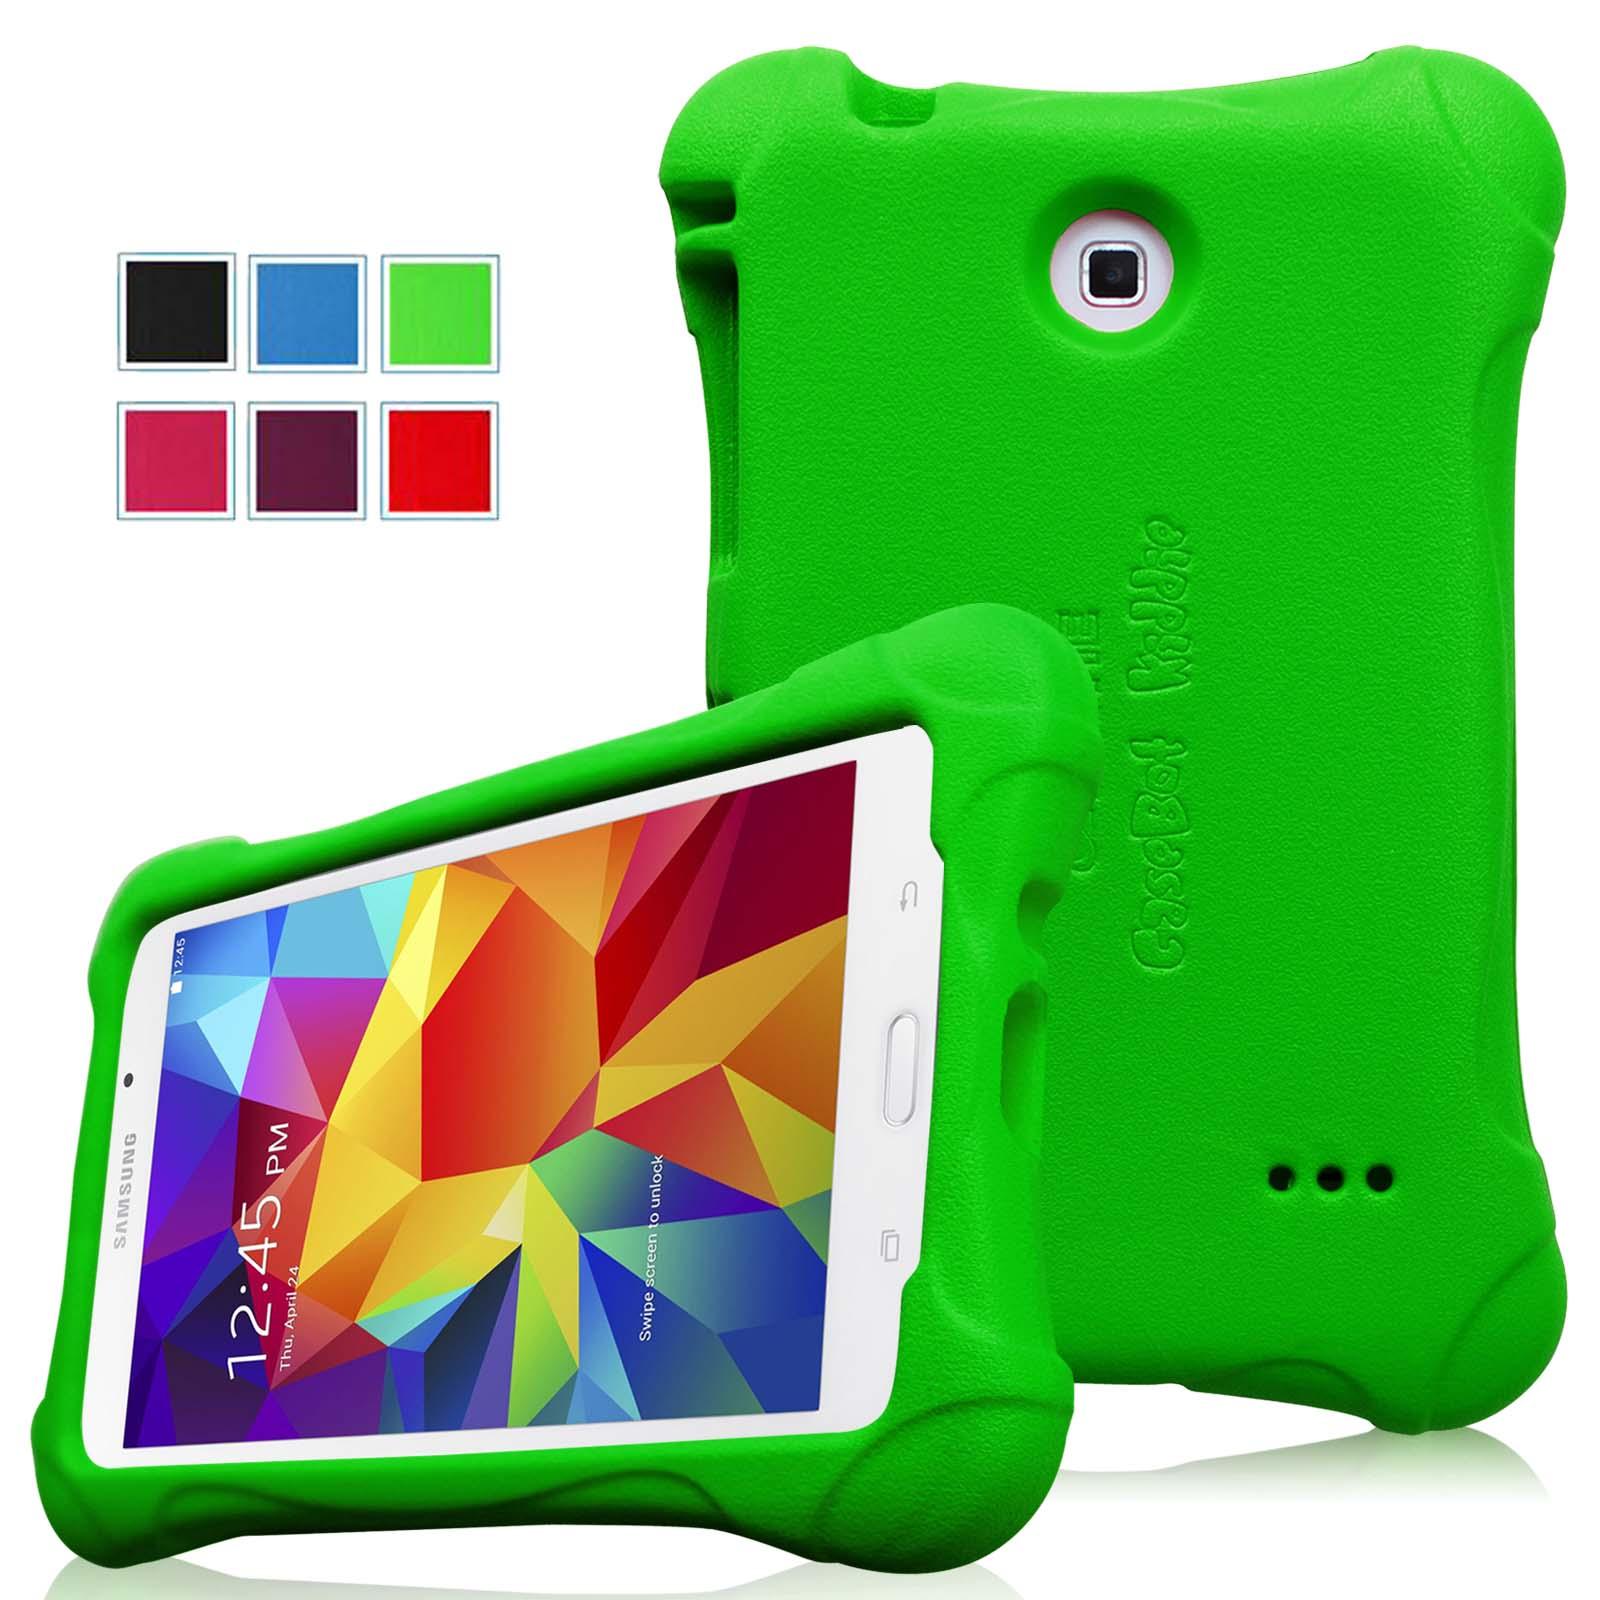 Fintie Samsung Galaxy Tab 4 7.0 Inch Kiddie Case - Ultra Light Weight Shock Proof Kids Friendly Cover, Green